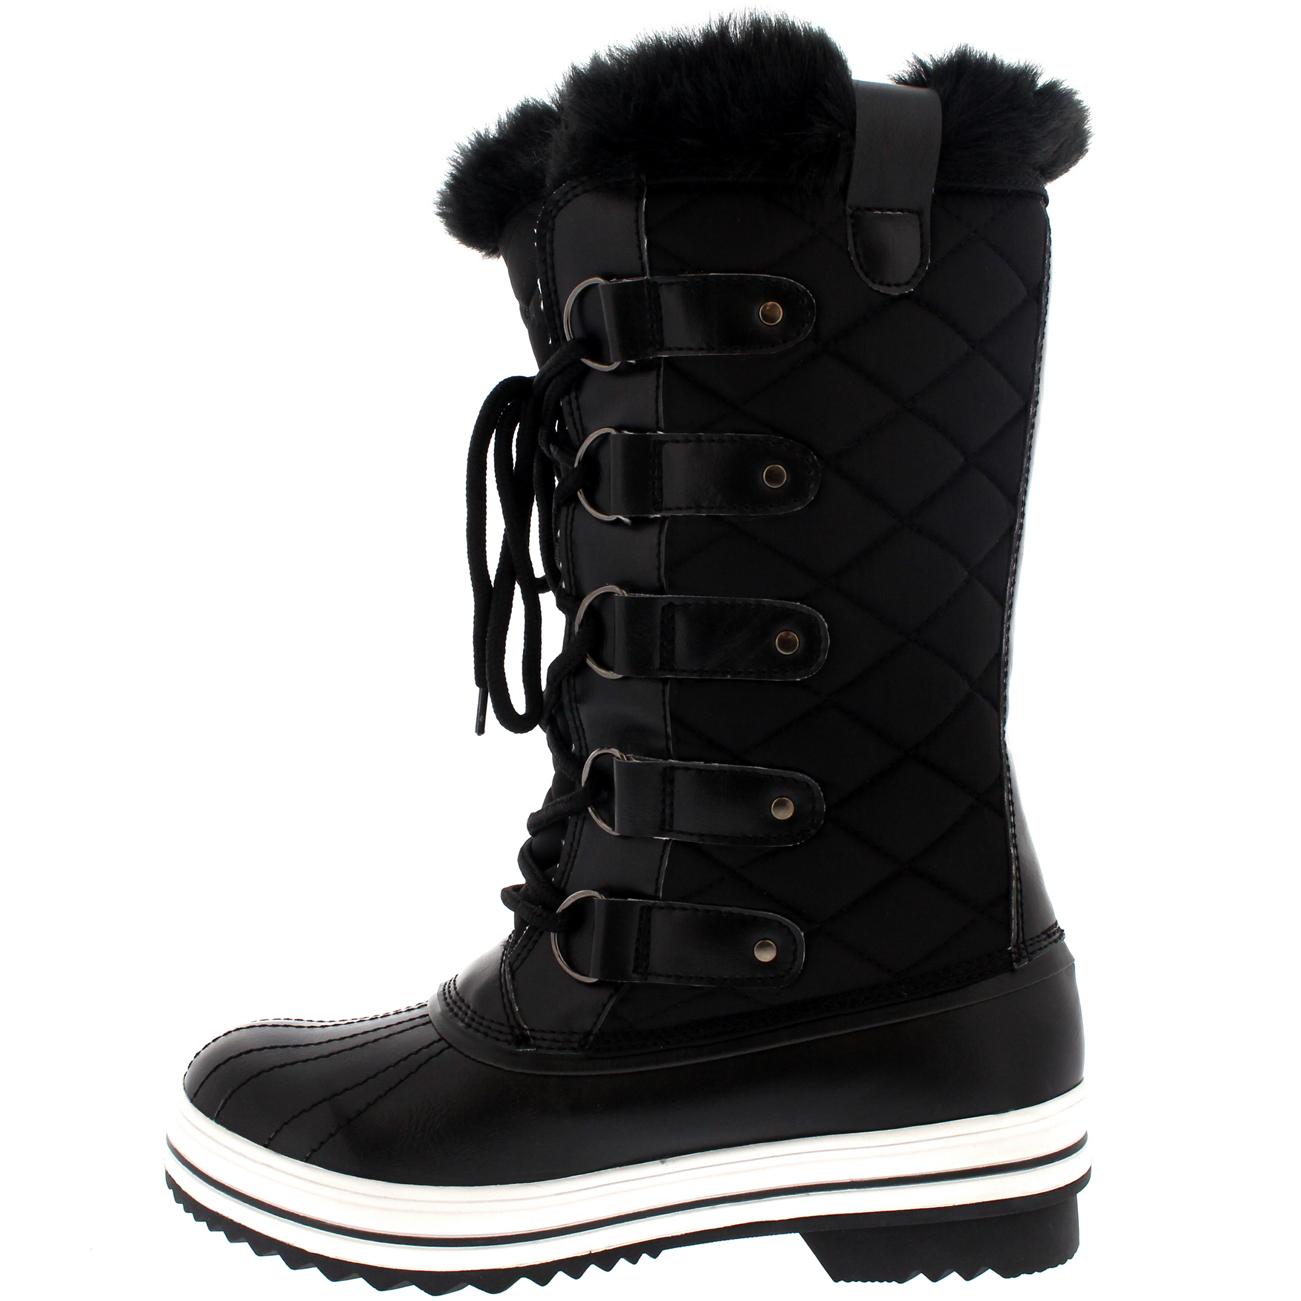 Ladies Snow Boot Nylon Tall Winter Waterproof Fur Lined ...